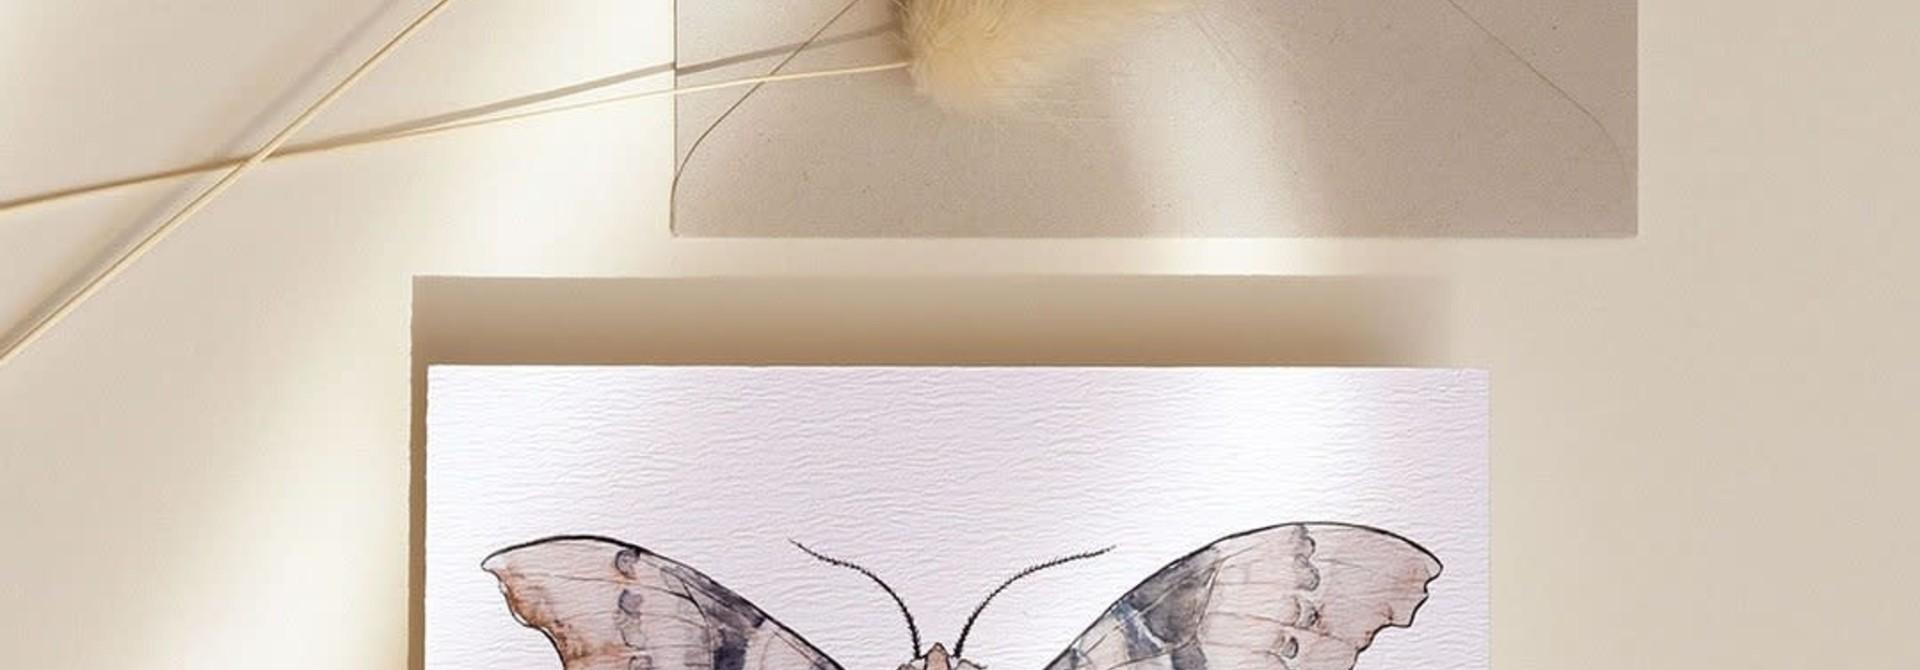 mms- Sphynx carte